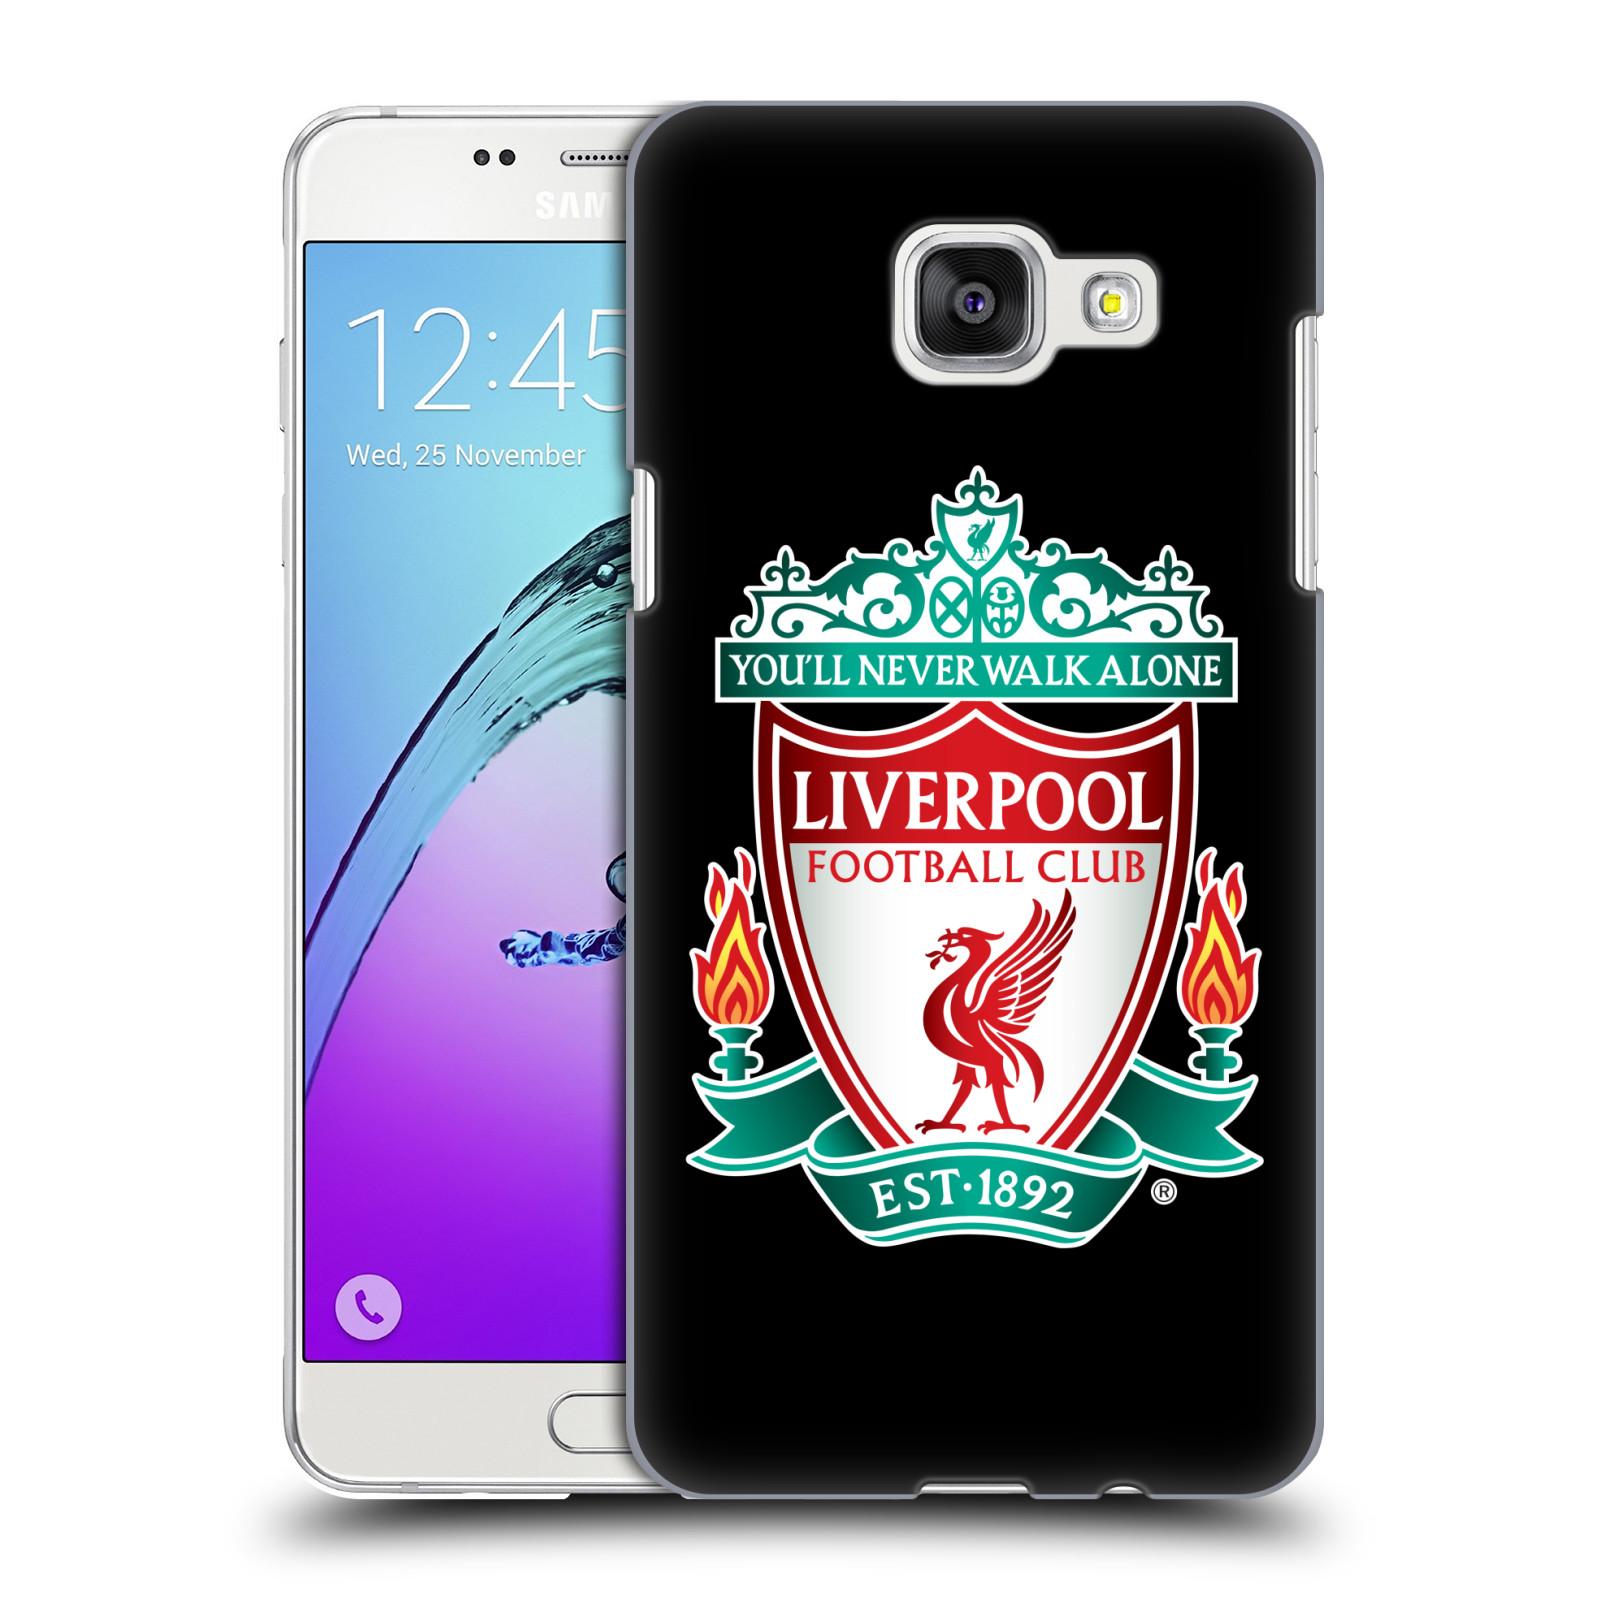 Plastové pouzdro na mobil Samsung Galaxy A5 (2016) HEAD CASE ZNAK LIVERPOOL FC OFFICIAL BLACK